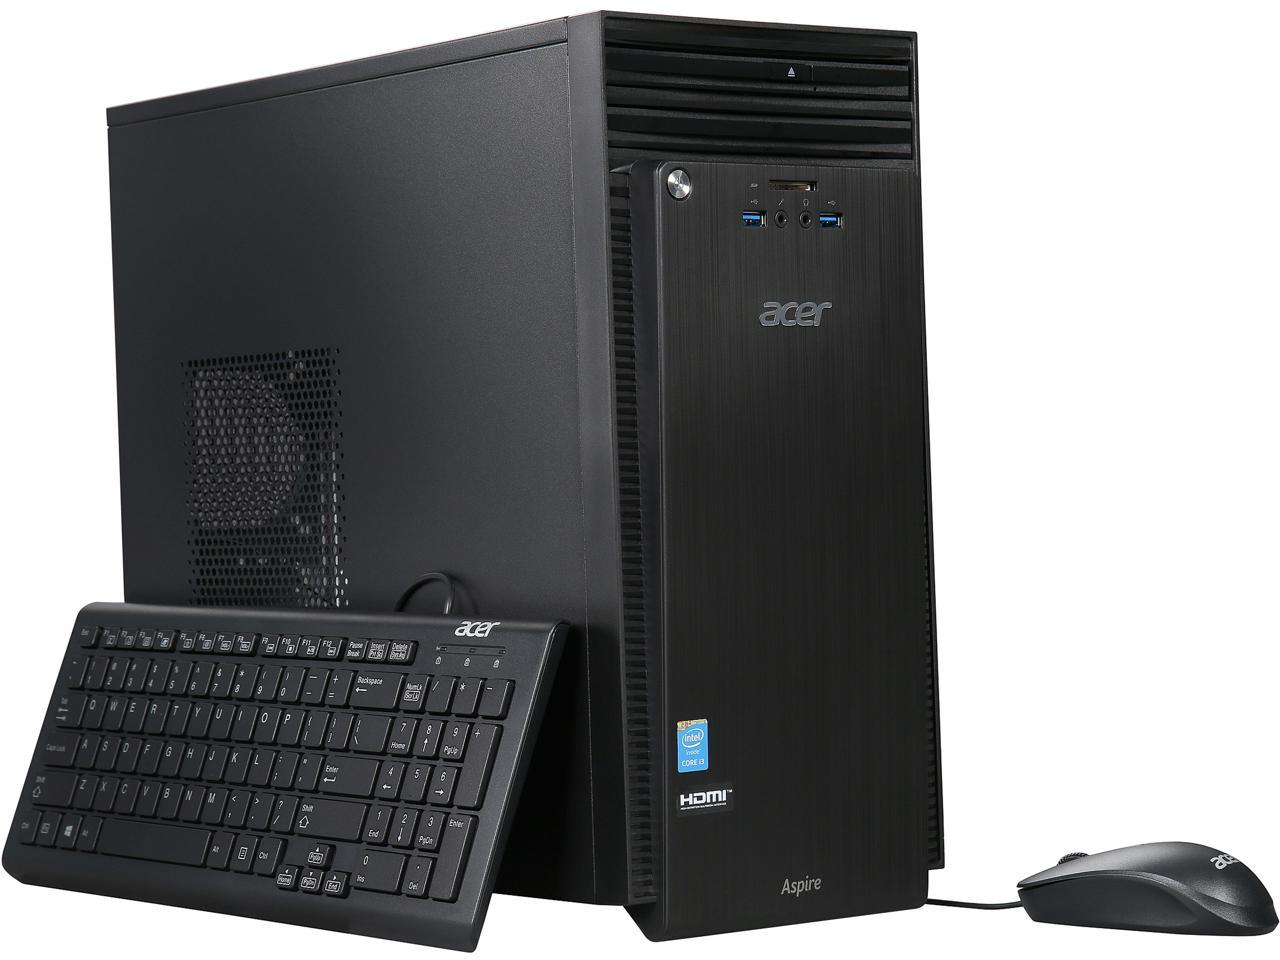 Acer Aspire T ATC-705-UR62 Desktop with Intel Core i3-4160 / 6GB / 1TB / Win 10